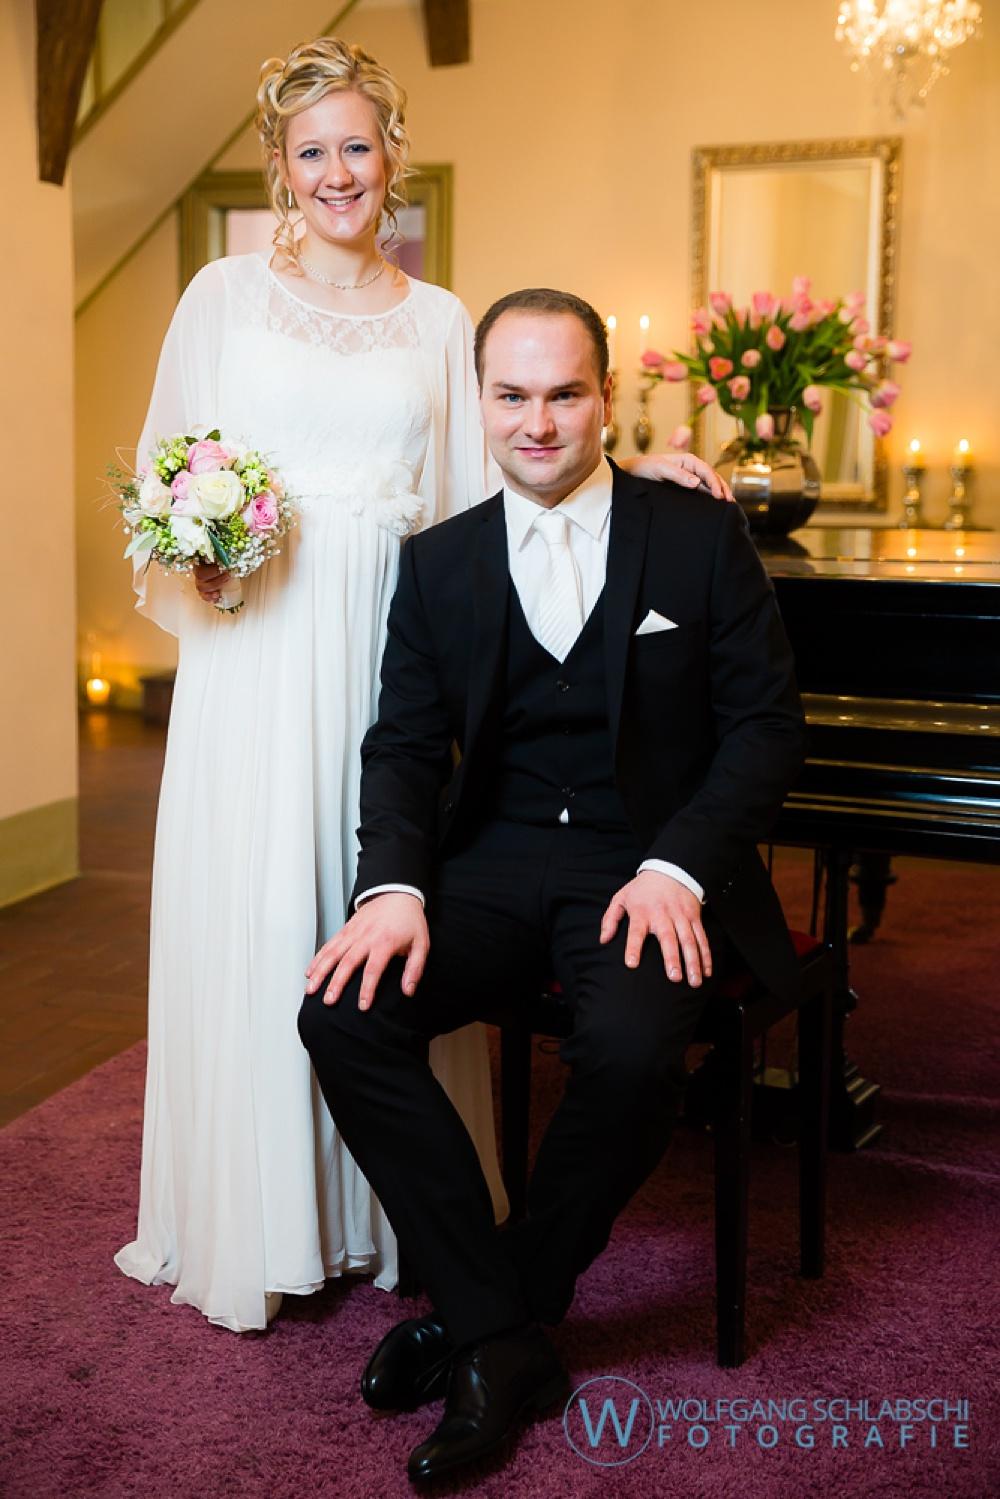 Hochzeit in der Kessler Beletage in Esslingen